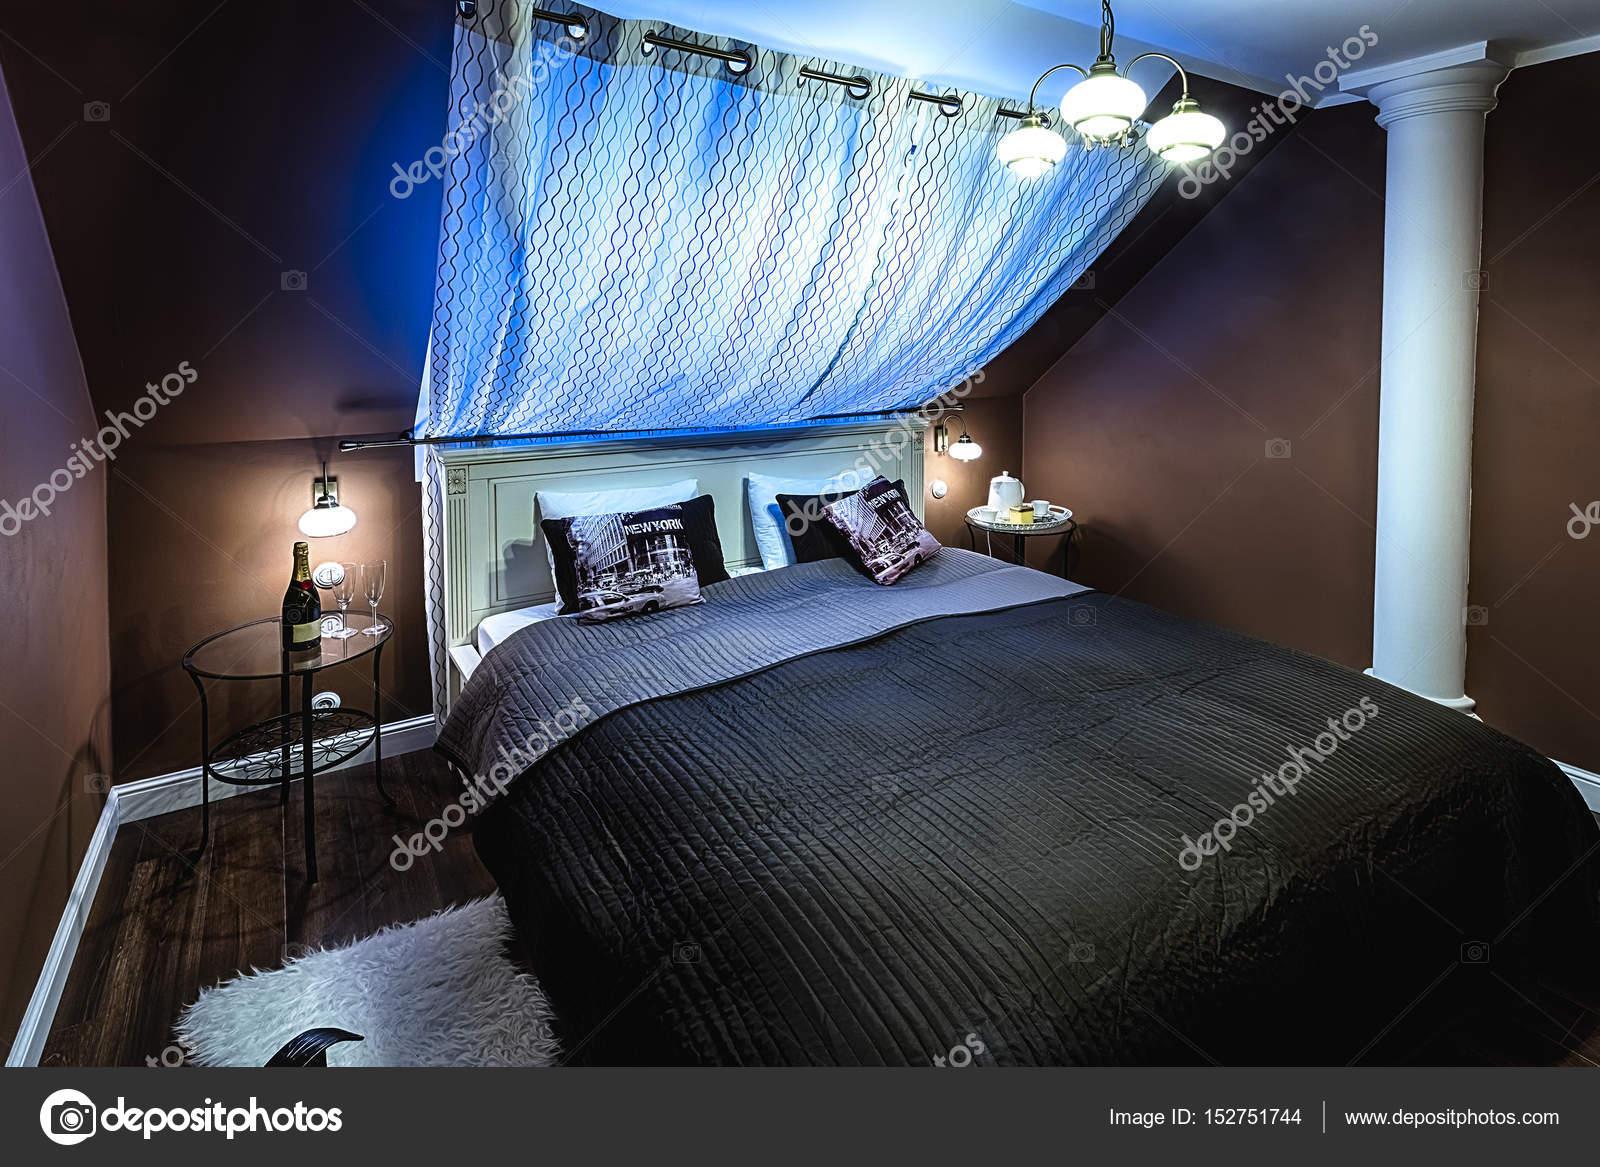 Slaapkamer Amerikaanse Stijl : Luxe hotel slaapkamer interieur u2014 stockfoto © kropic #152751744